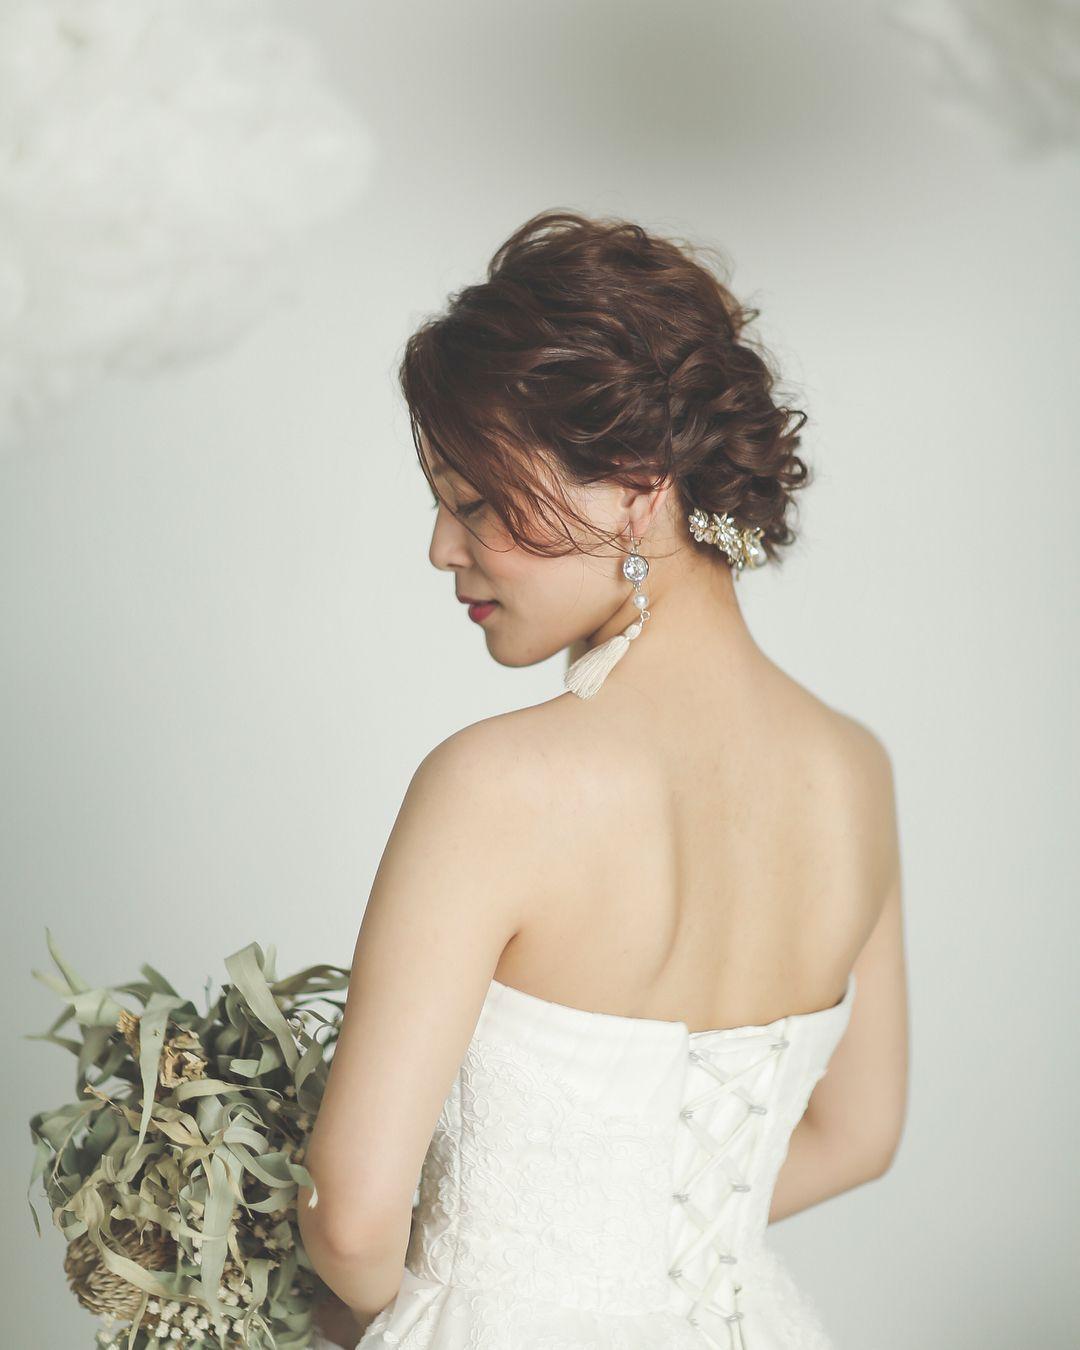 306e1e4e69850 結婚式の花嫁さん向け、ウェディングドレスや和装に合う髪型、ヘア ...